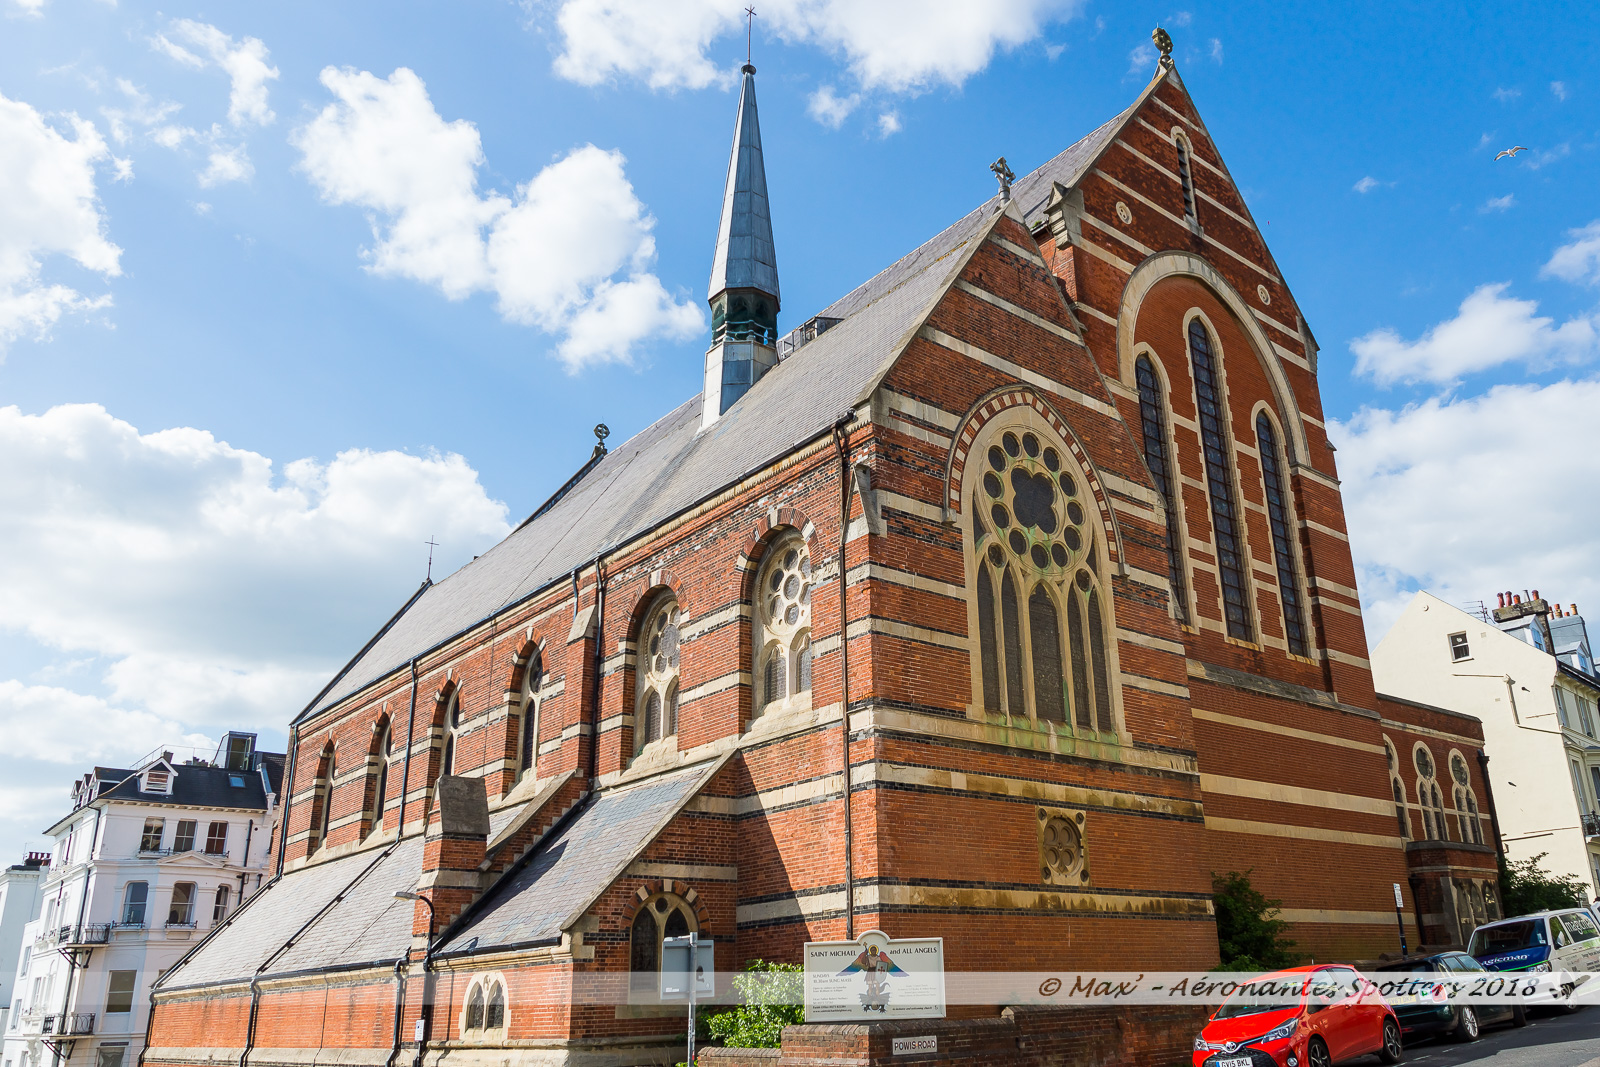 The Parish Church of Saint Michael & All Angels Brighton